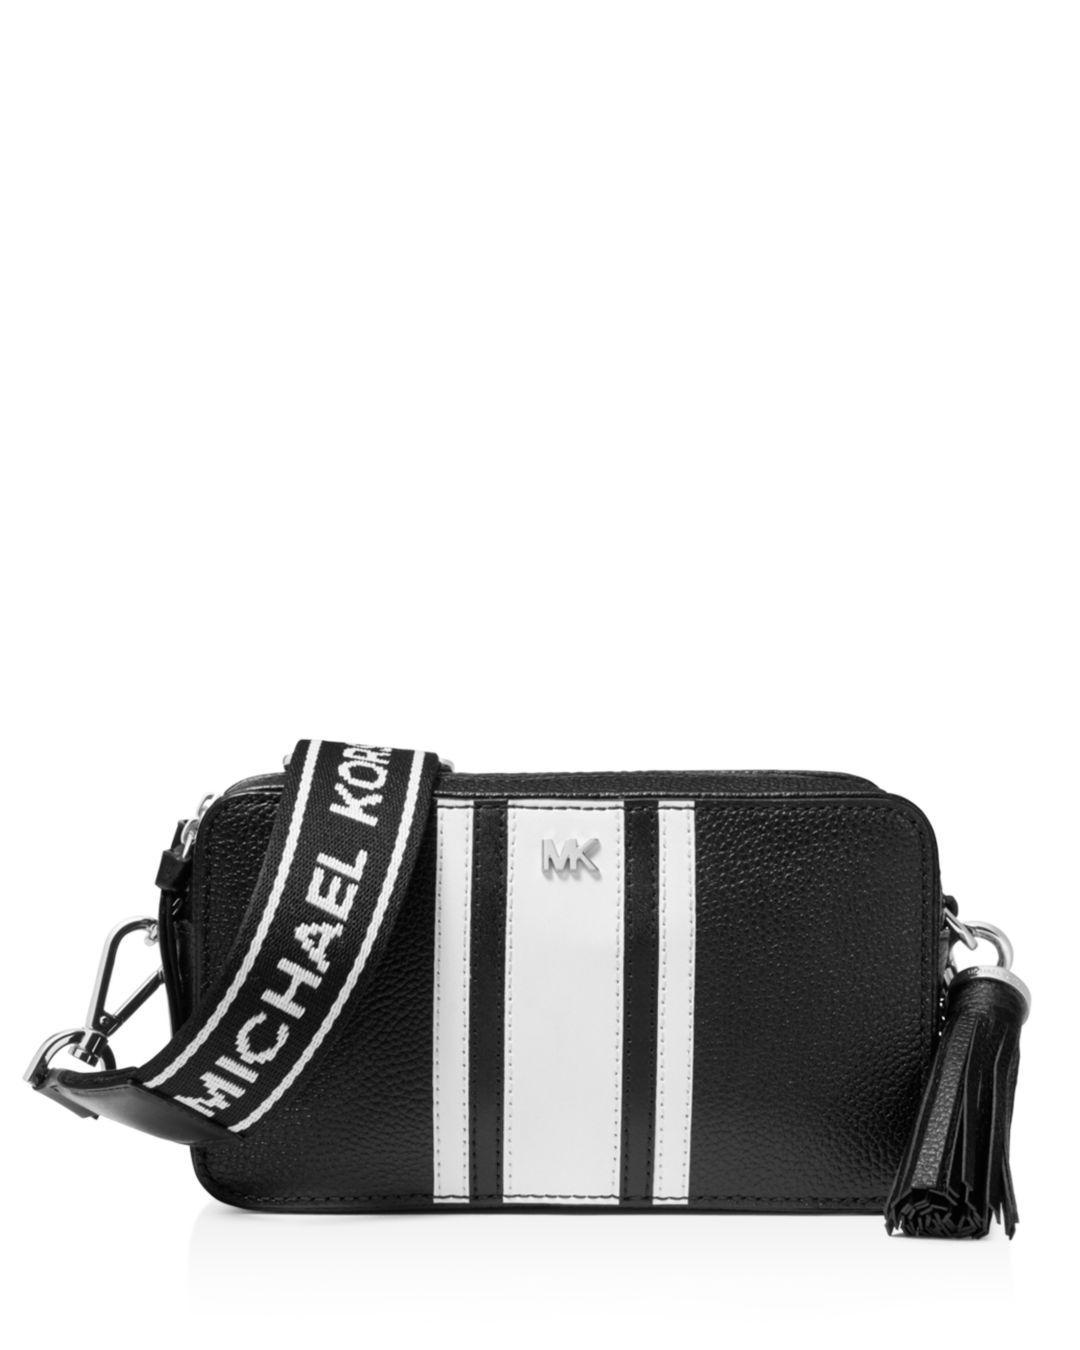 a4d0cd2eb9b8 Lyst - Michael Kors Michael Logo Pebble Leather Camera Bag in Black ...